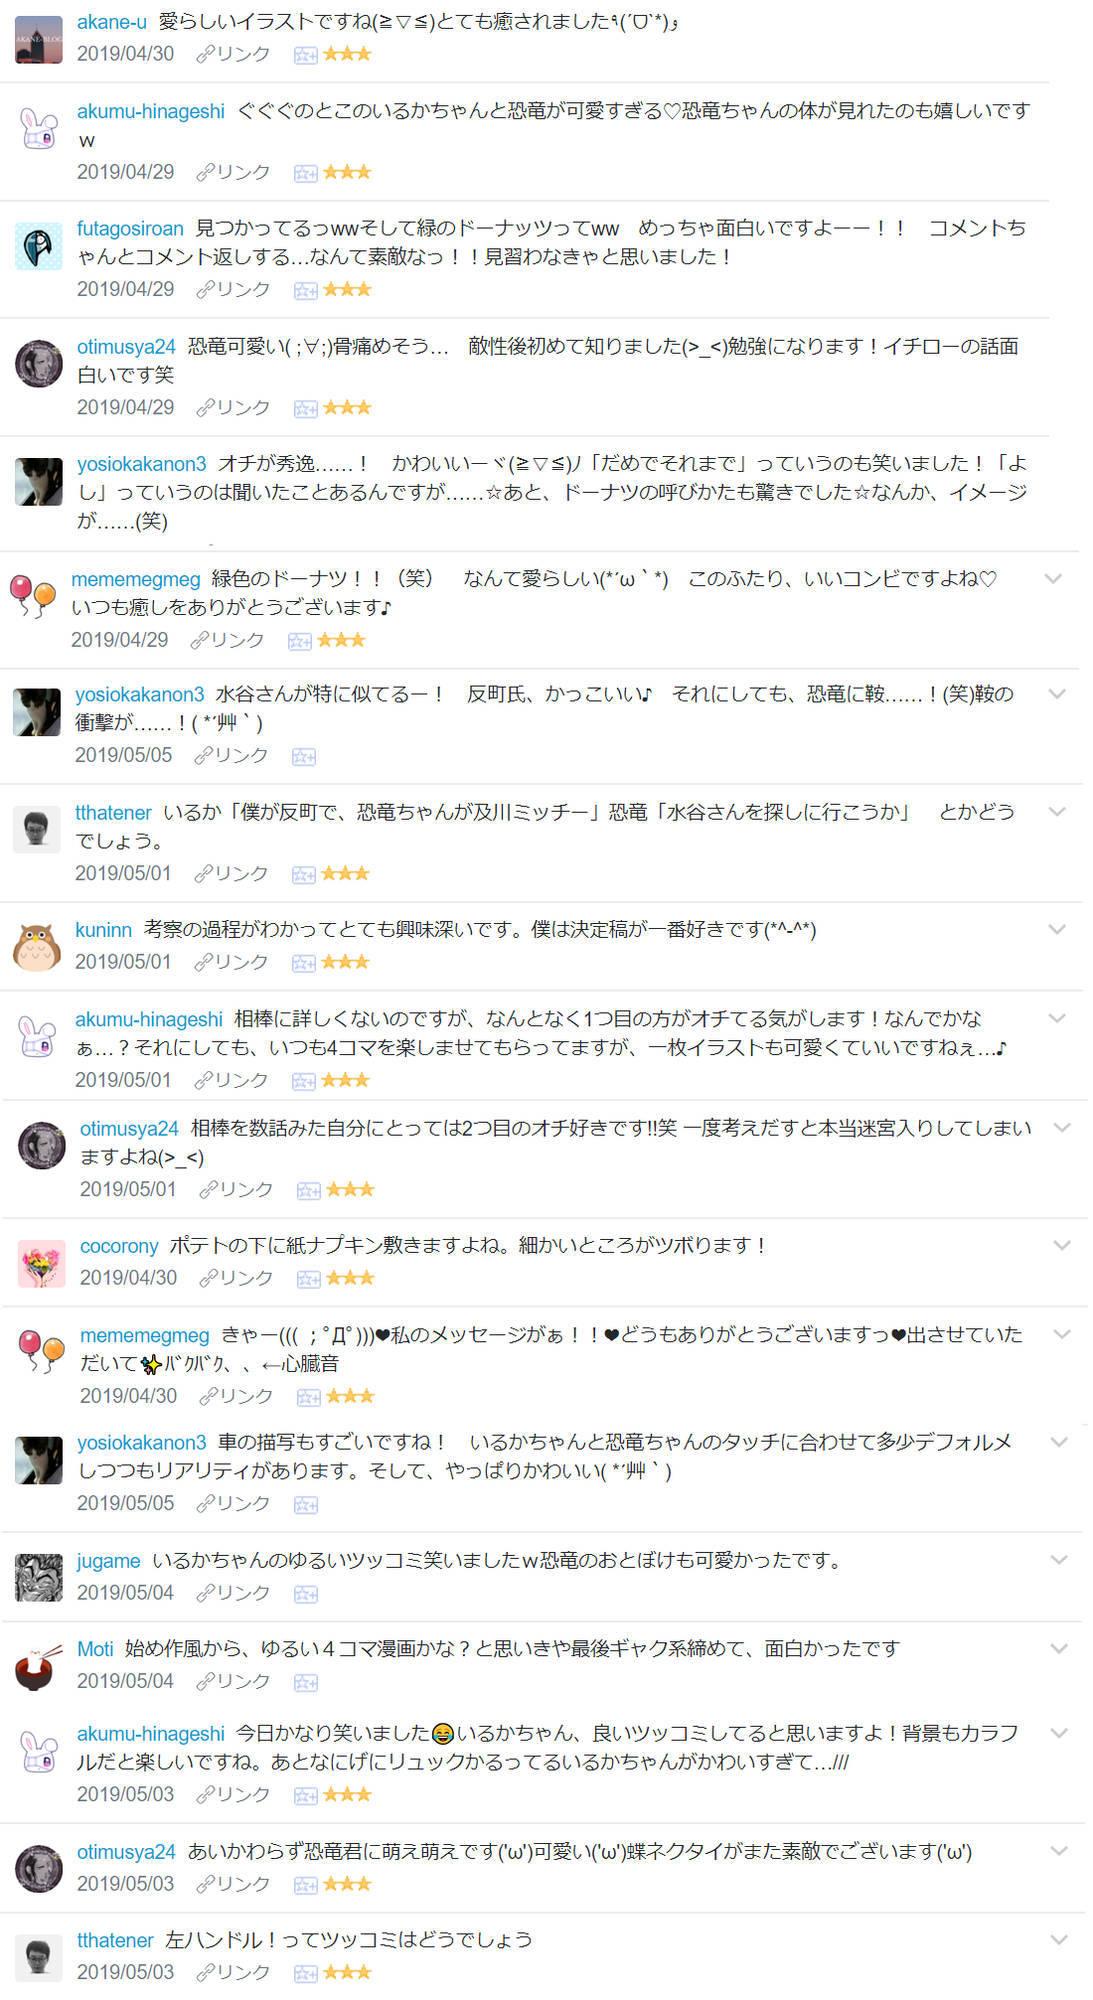 f:id:shiro_iruka:20190505211258j:plain